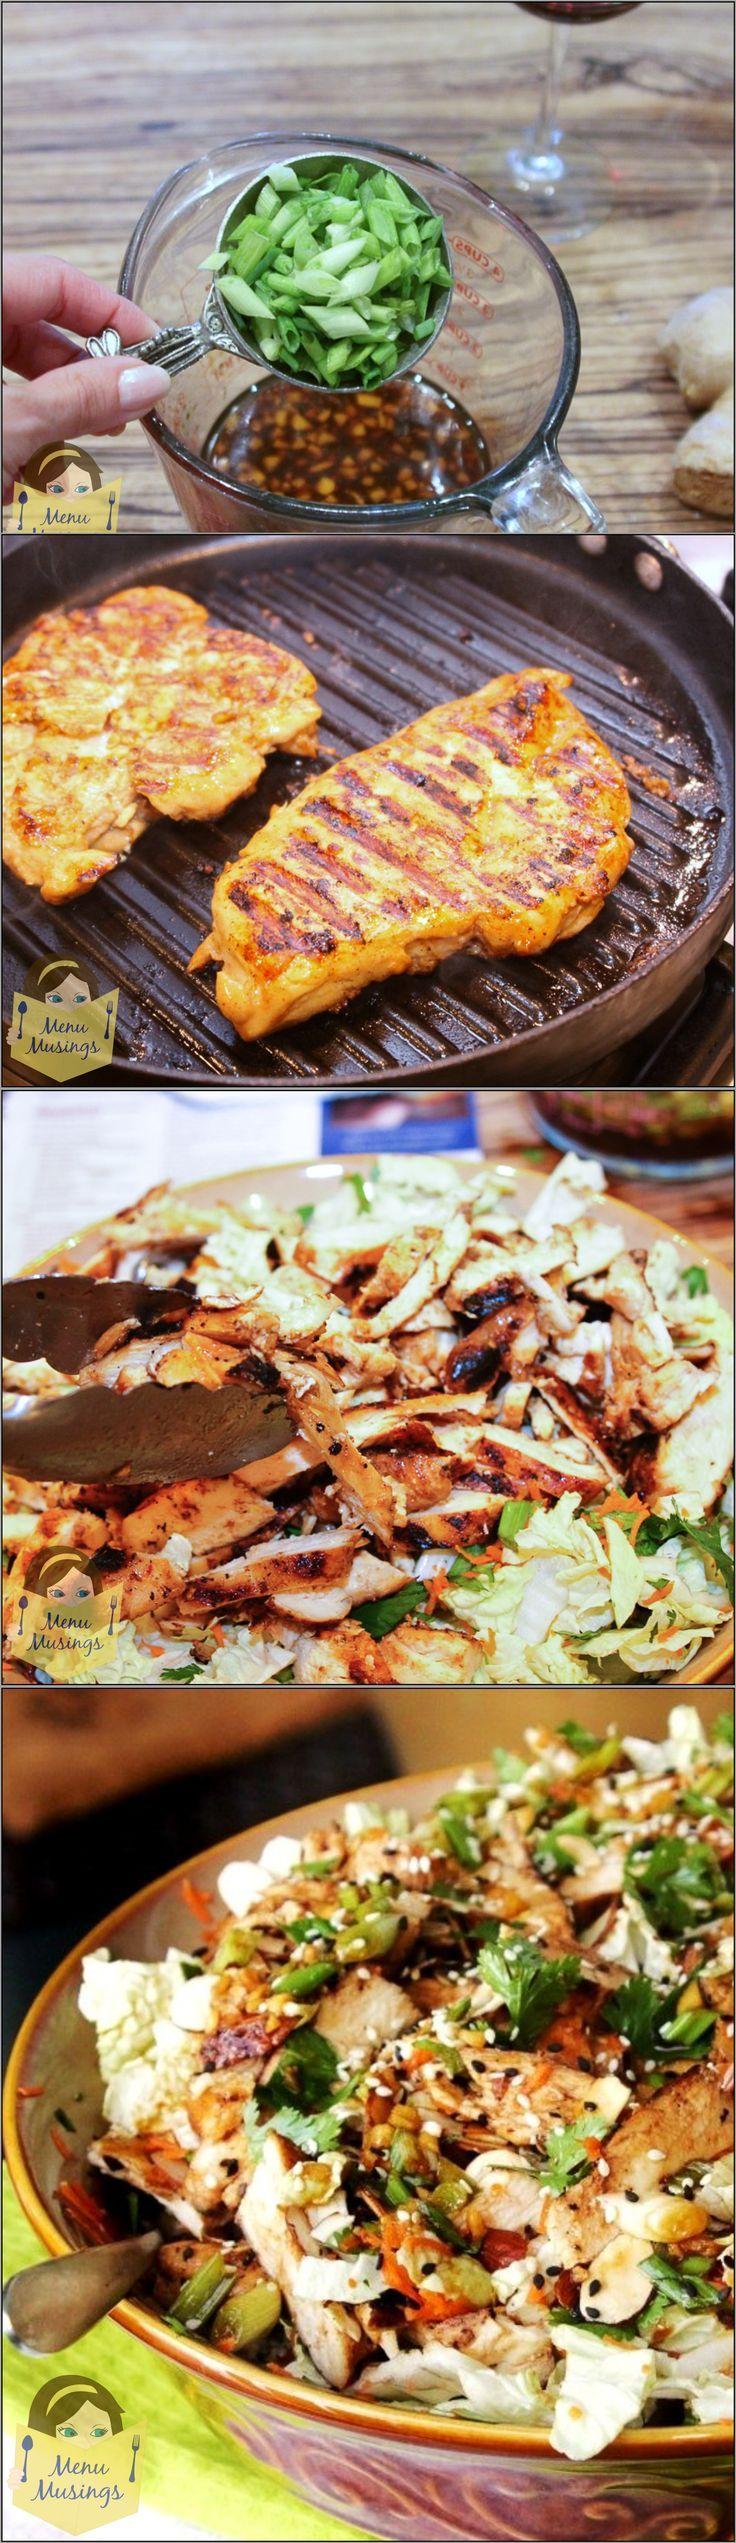 salad # snack chili lime sweet corn salad sue 2014 chili lime sweet ...